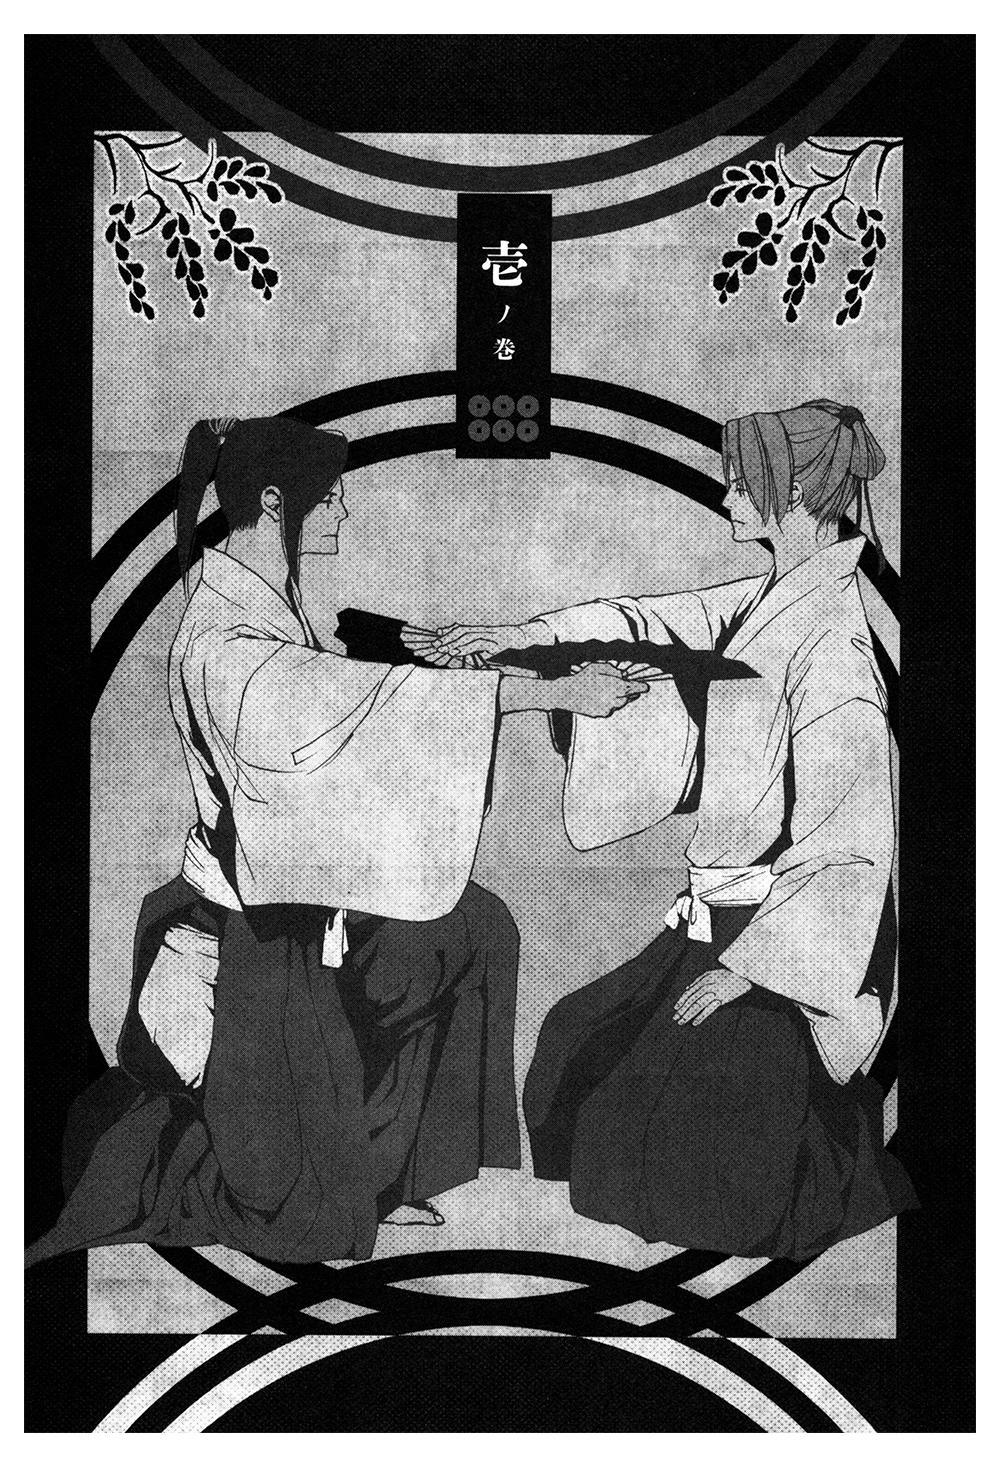 朱黒の仁 第1話①syukoku-1-03.jpg